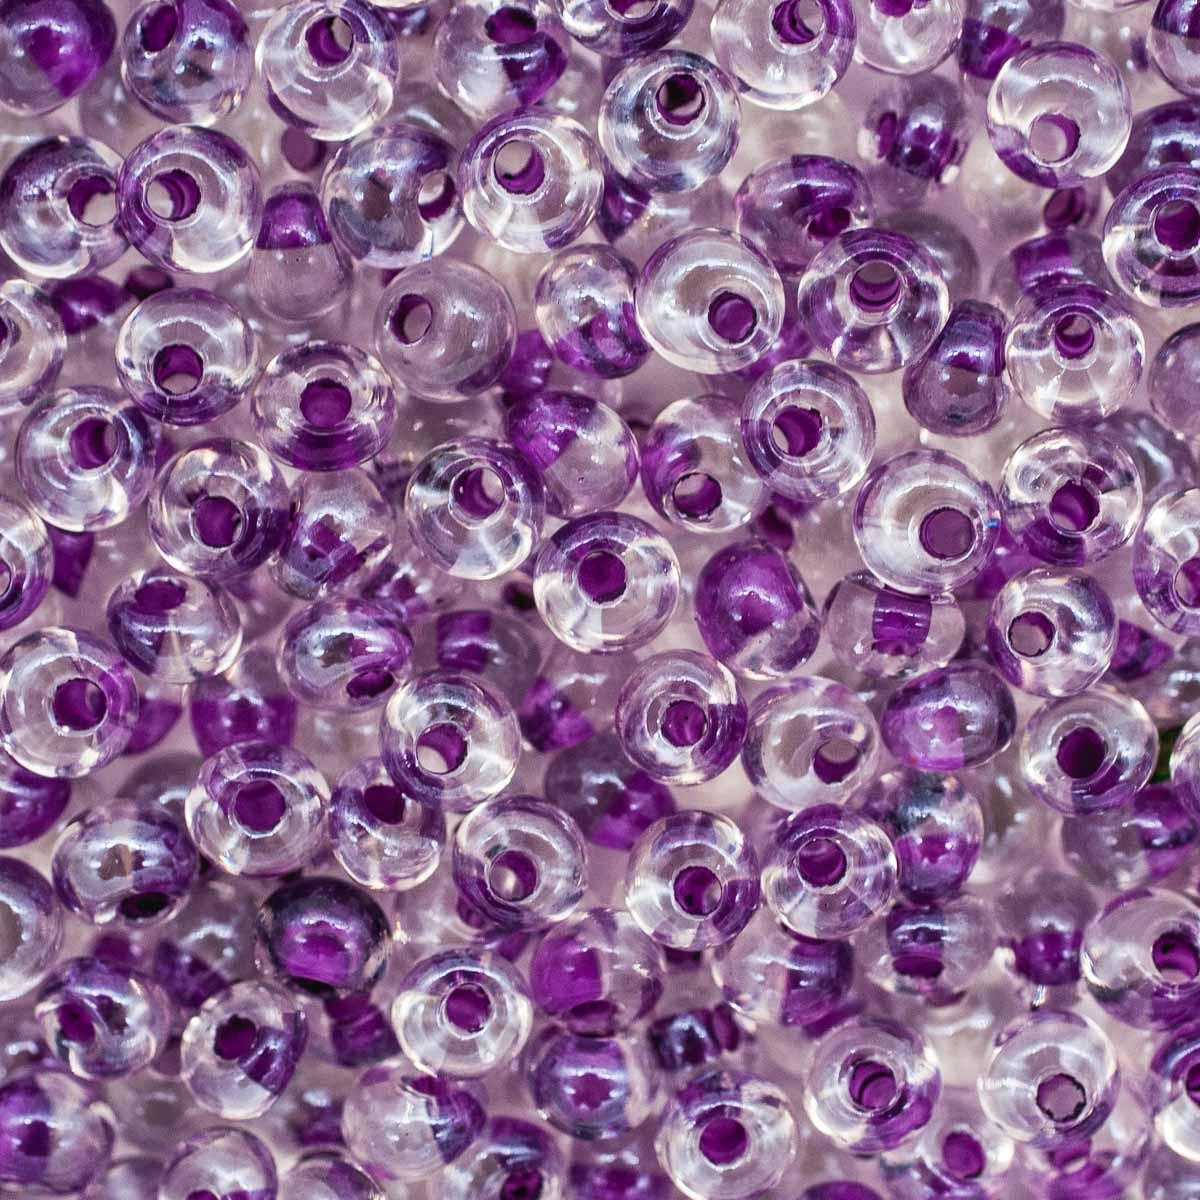 Бисер Drops 5/0 (~4,5мм) (38628) прозрачный с цветным центром, 50гр Preciosa